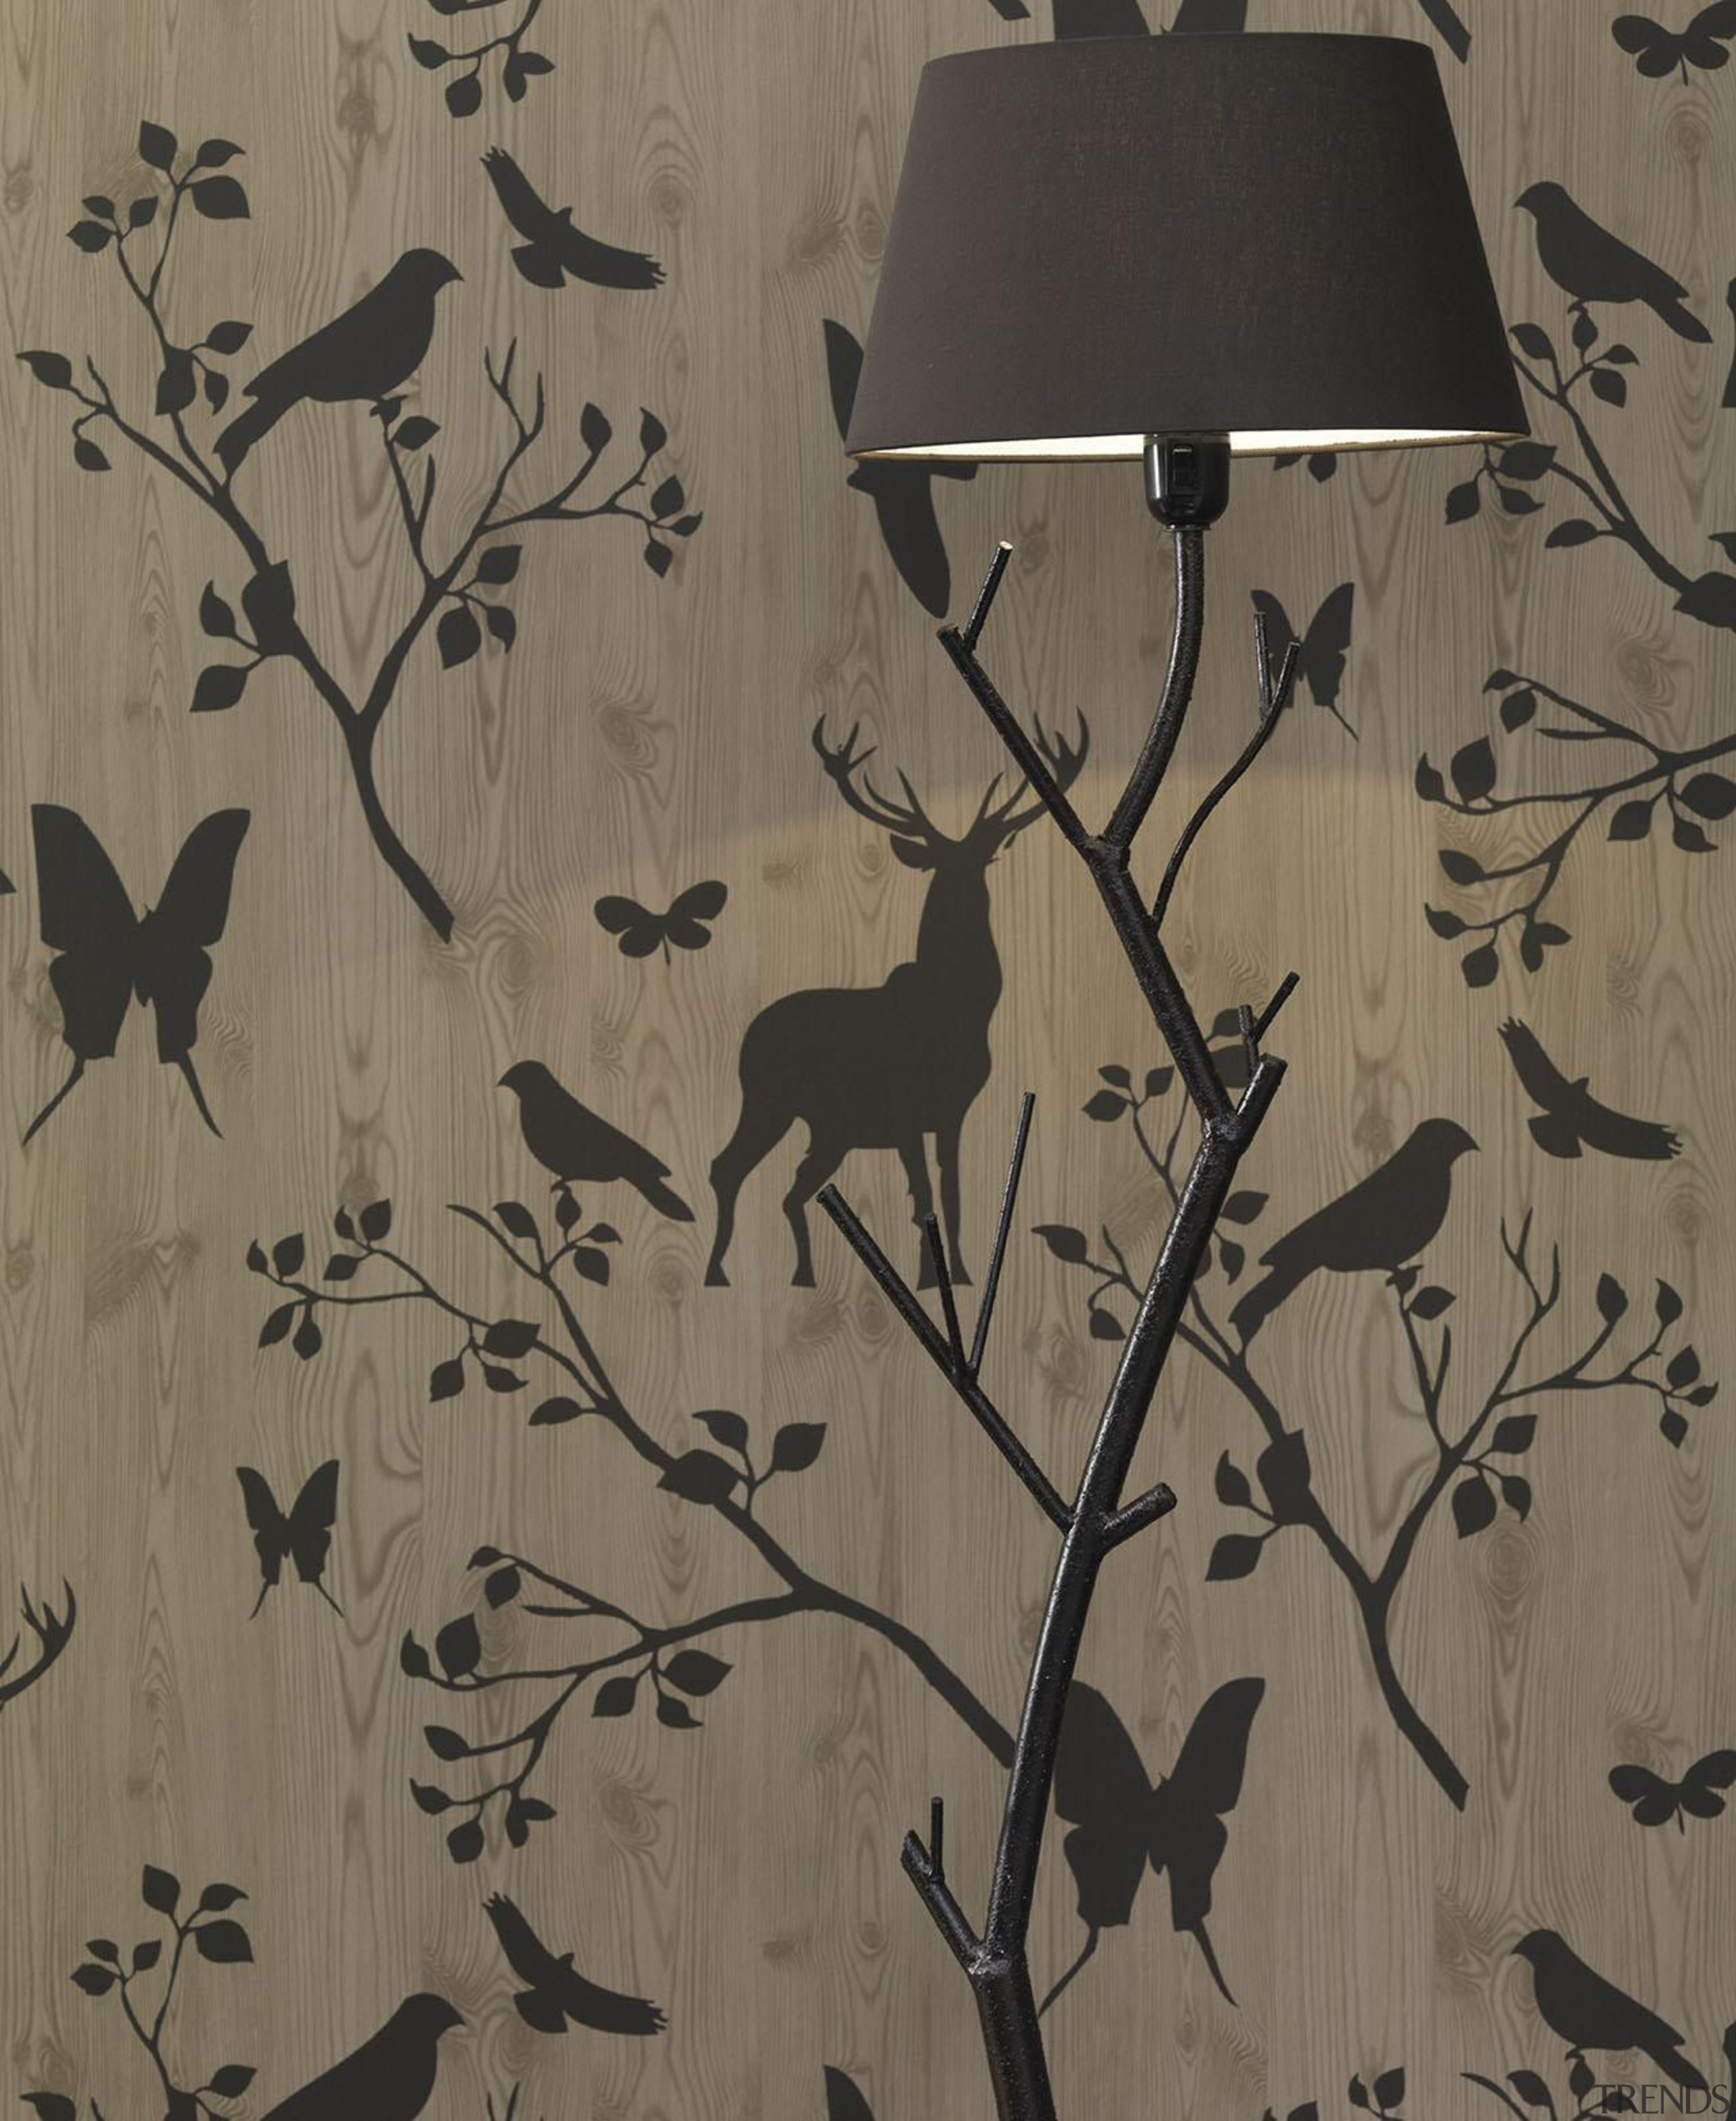 Modern Style Range - branch | design | branch, design, fauna, pattern, wall, wallpaper, wood, gray